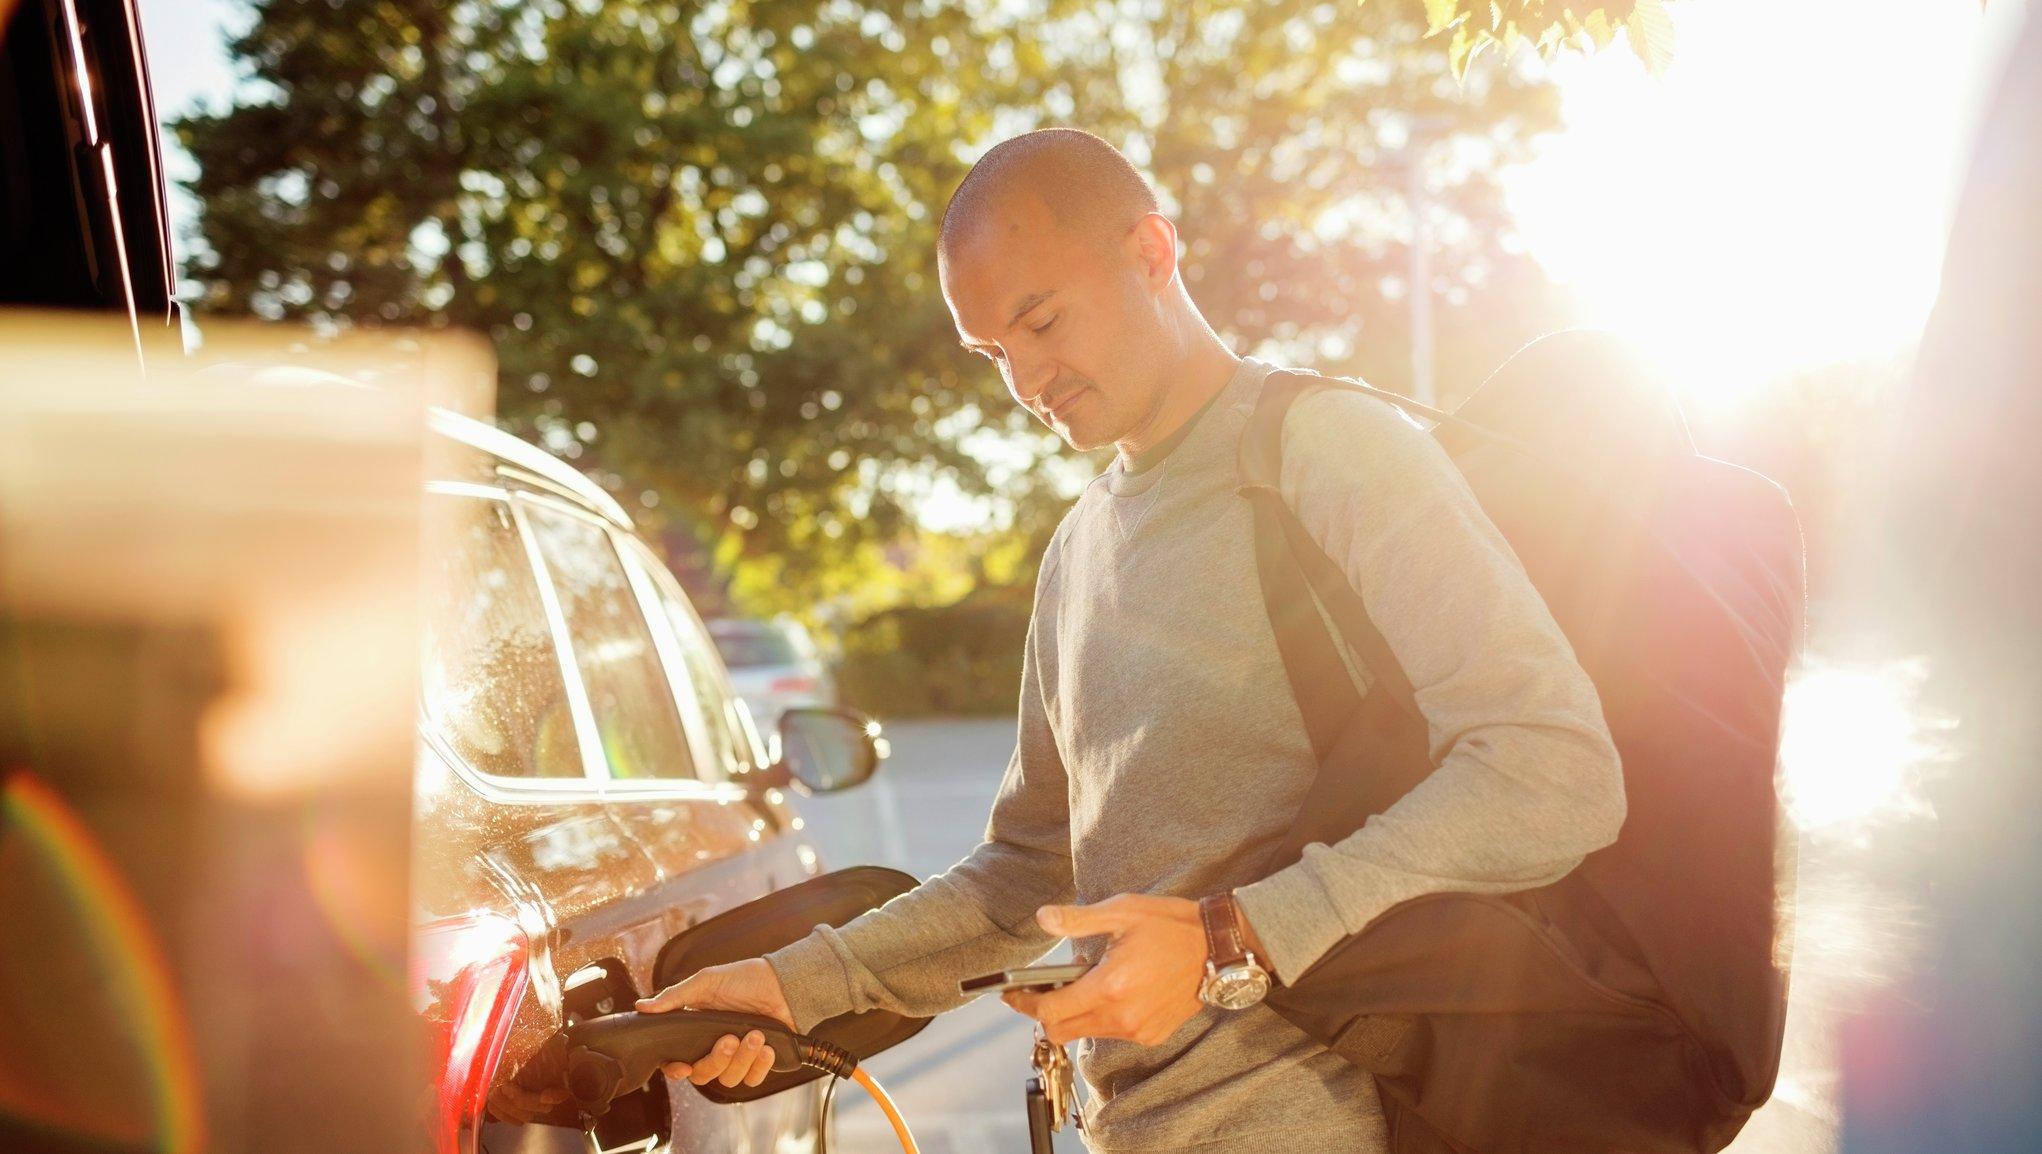 Mann som lader elektrisk bil